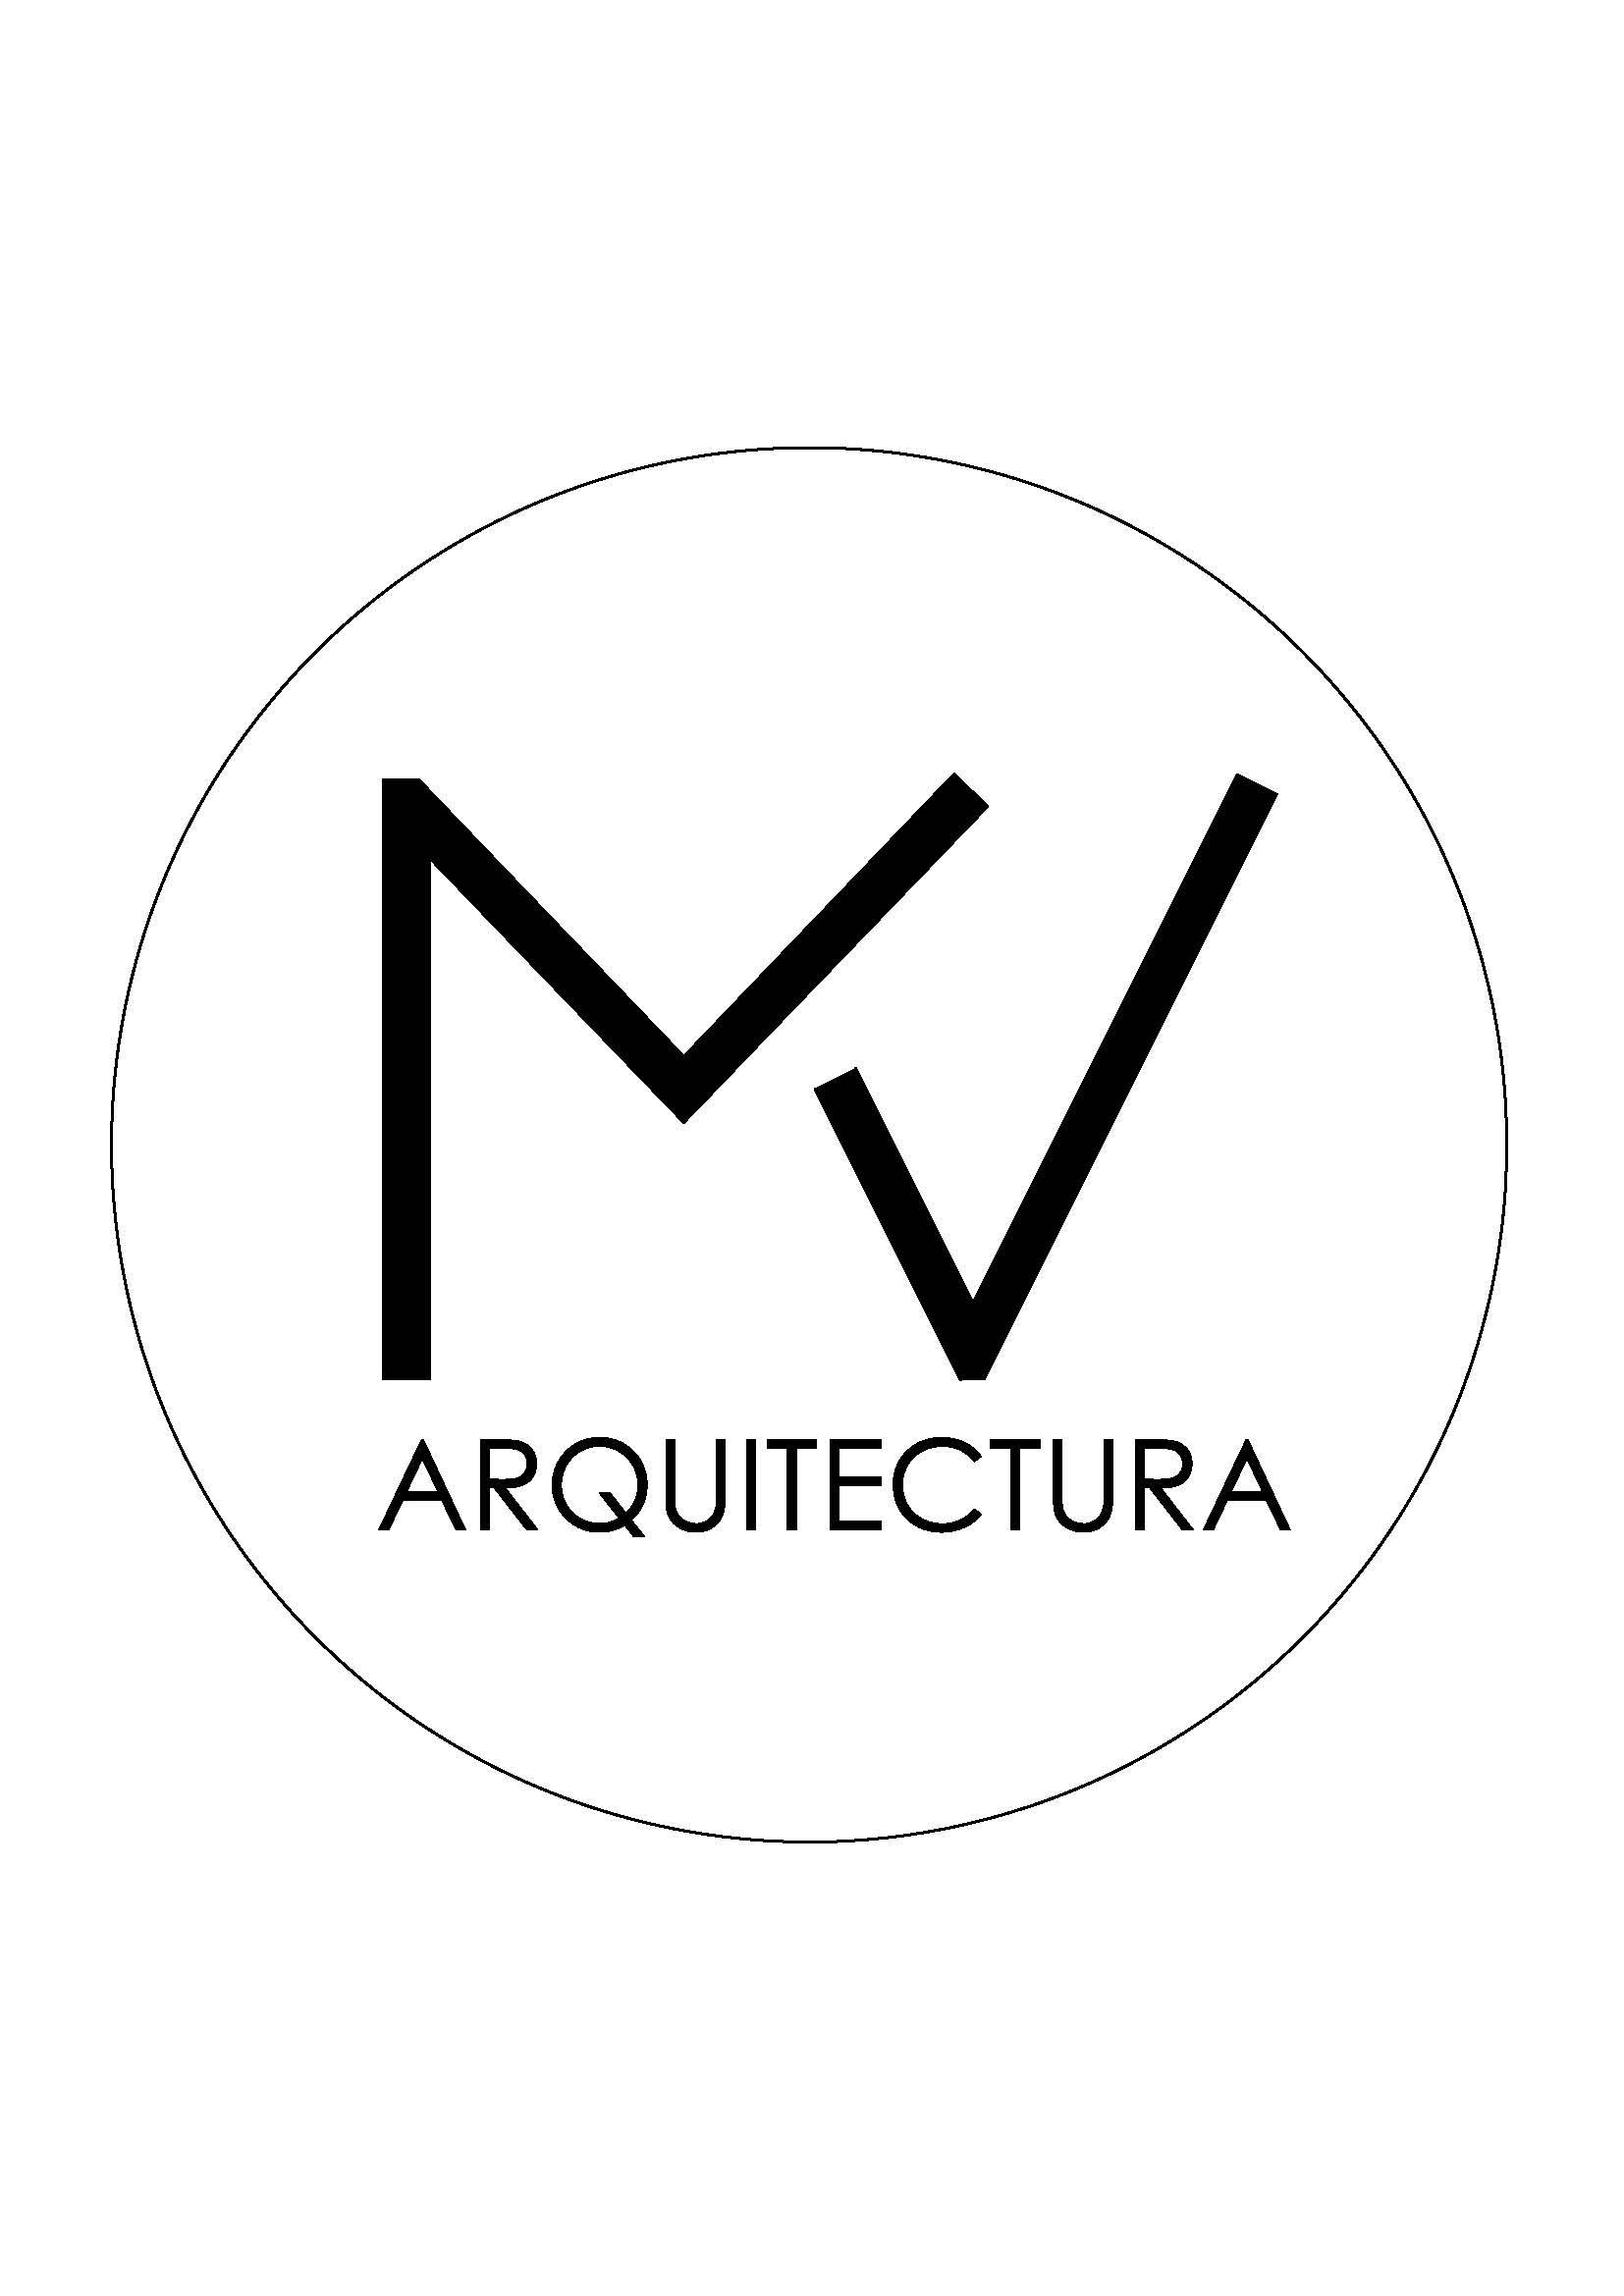 Mv arquitectura